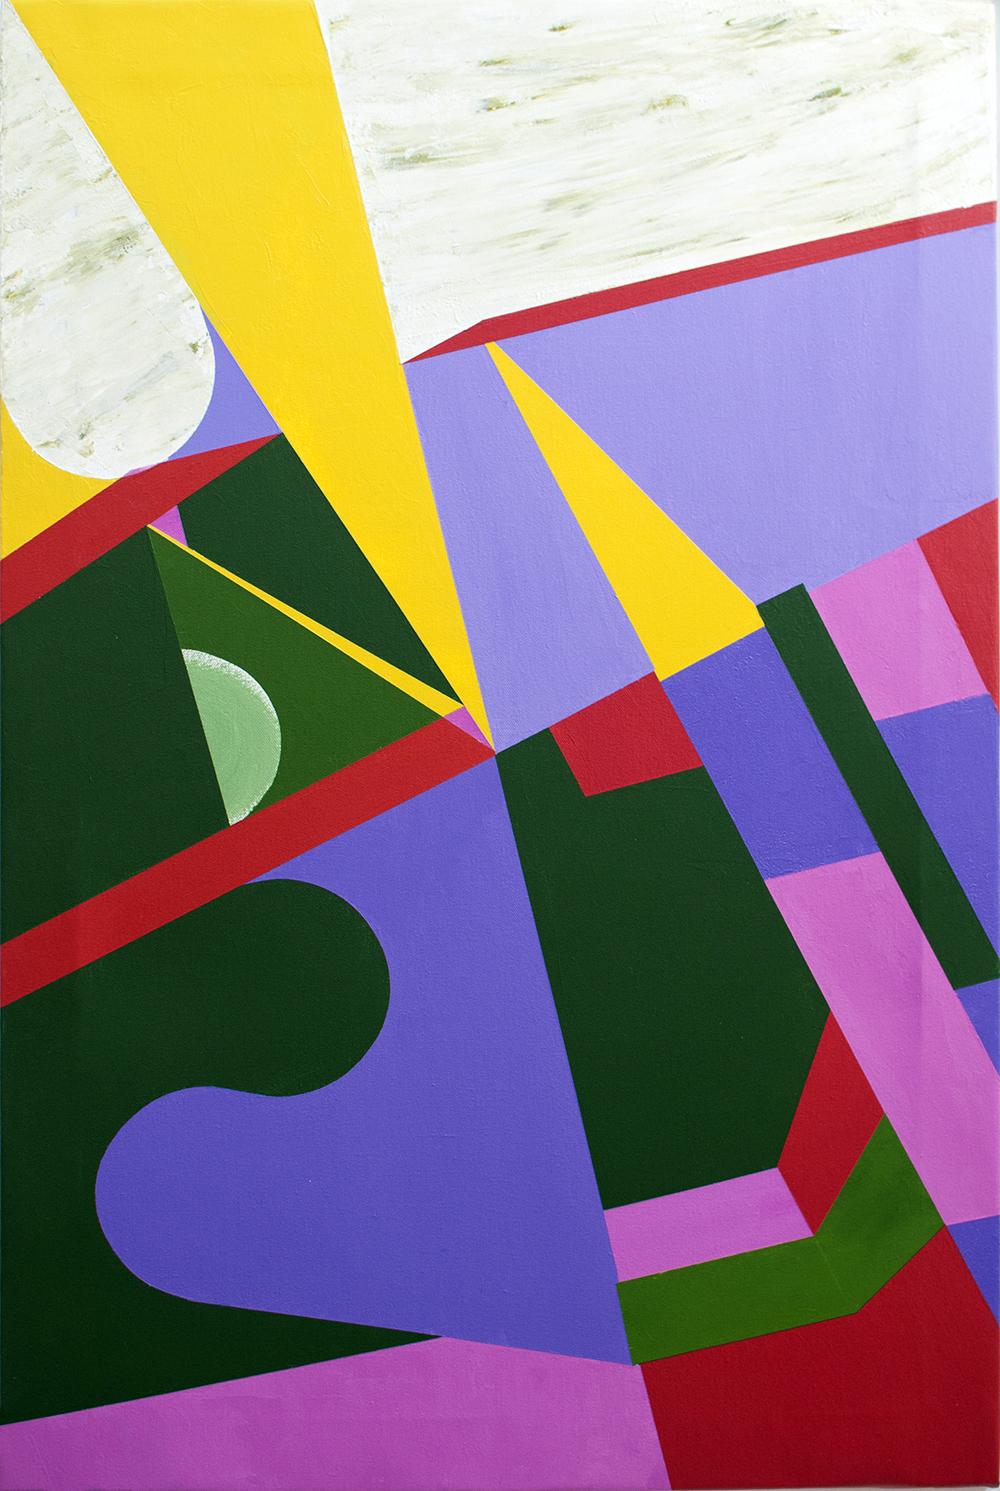 81 cm x 54 cm, Acrílico sobre lienzo, 2018